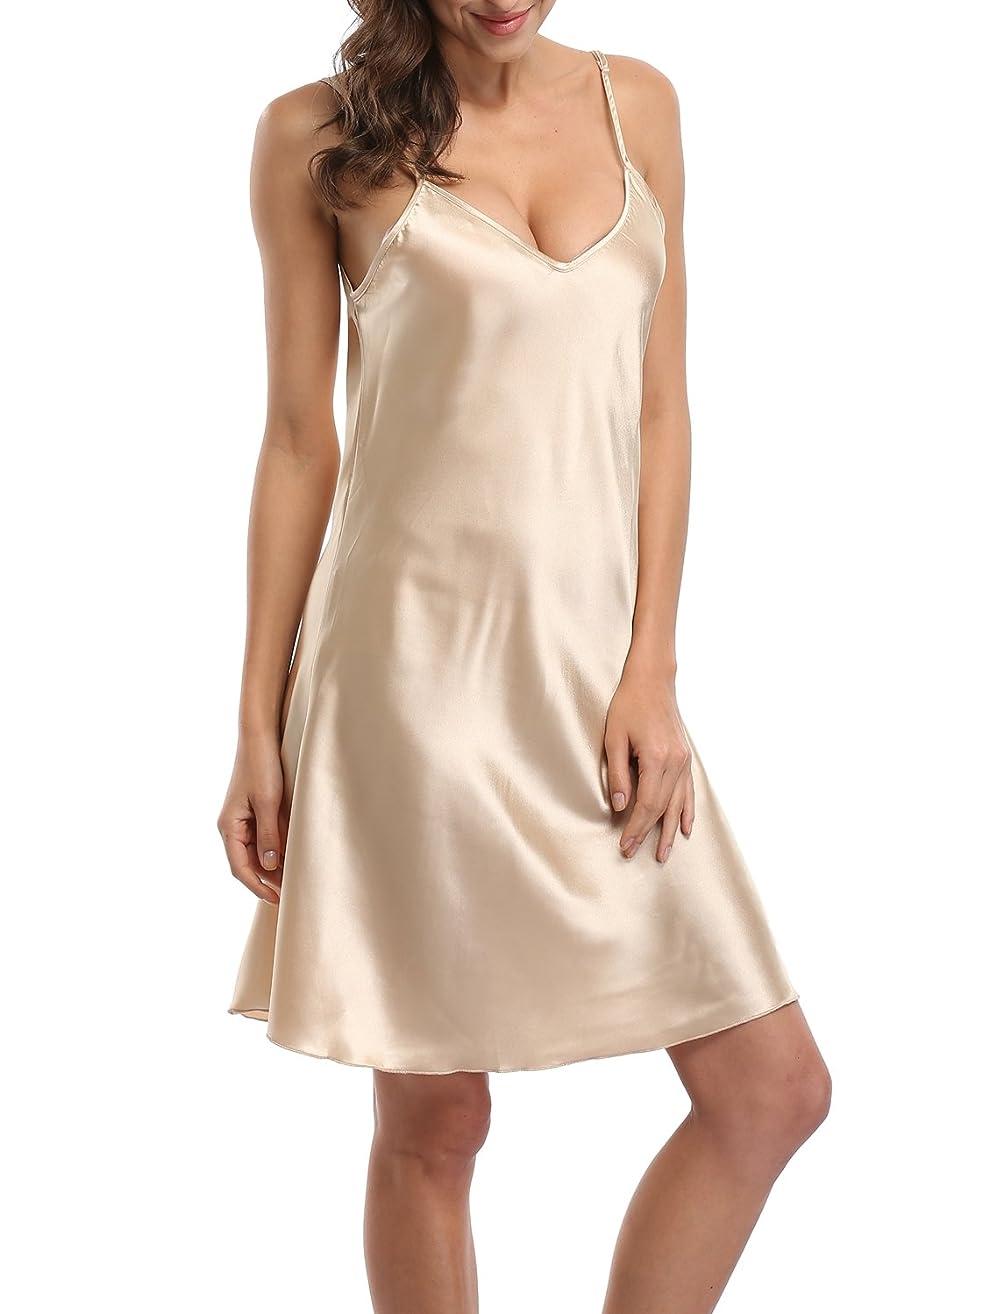 d-to-New Women's Sexy Slip Nightgown Chemises Full Srap Nightdress Summer Dress Satin V-Neck Nightshirts Plus Size ?-